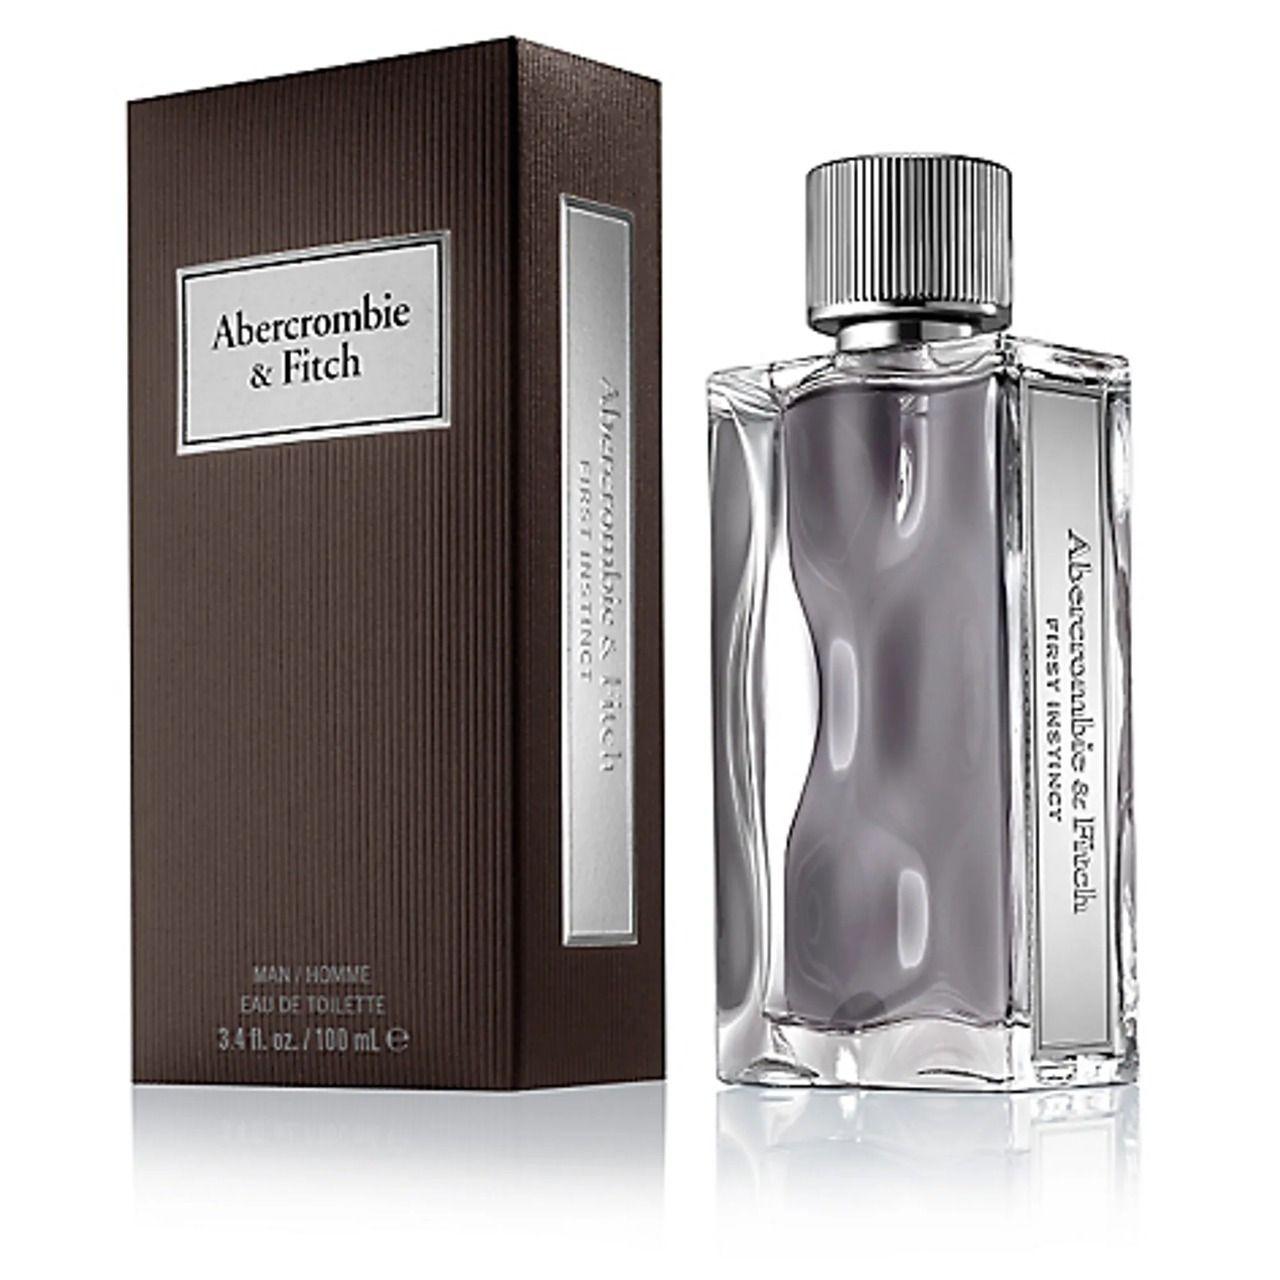 Abercrombie & Fitch Eau de Toilette Perfume Masculino